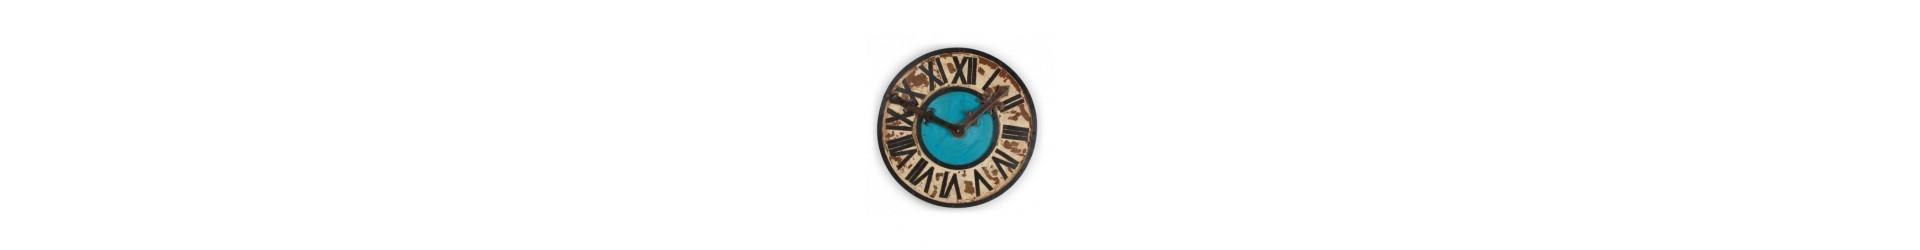 Household clocks, wall clocks